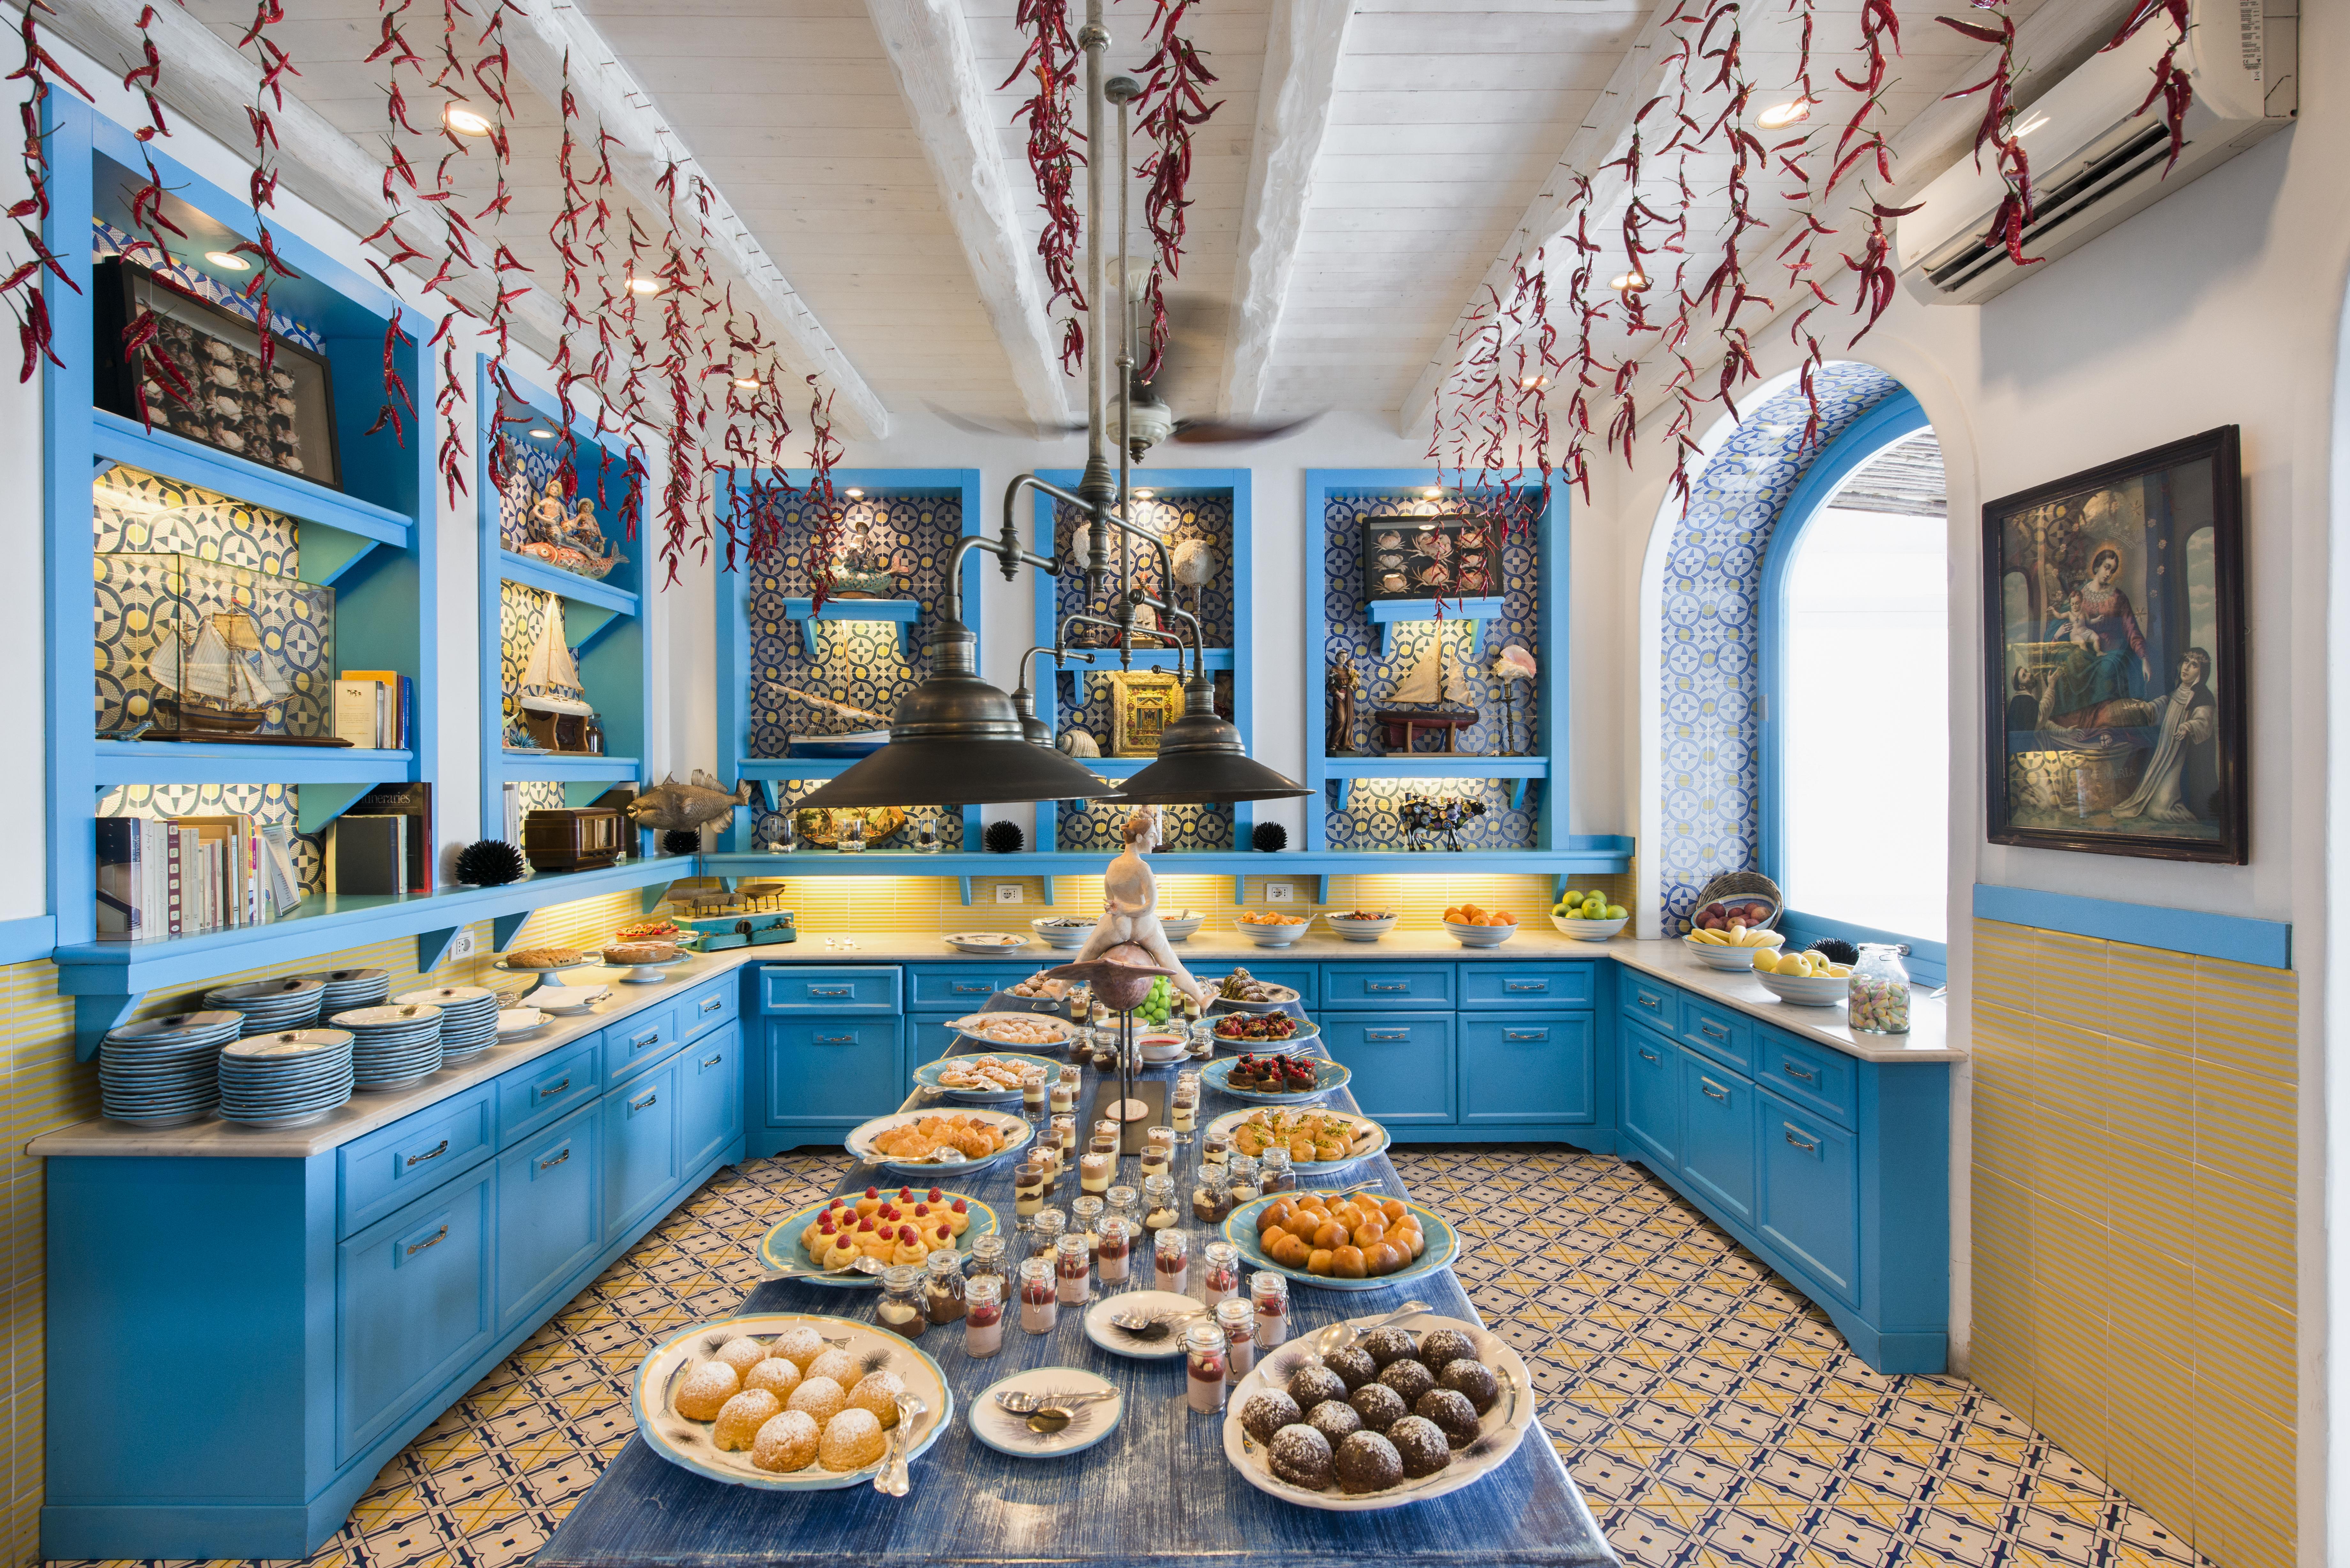 italian michelin guide results 2016 great italian chefs